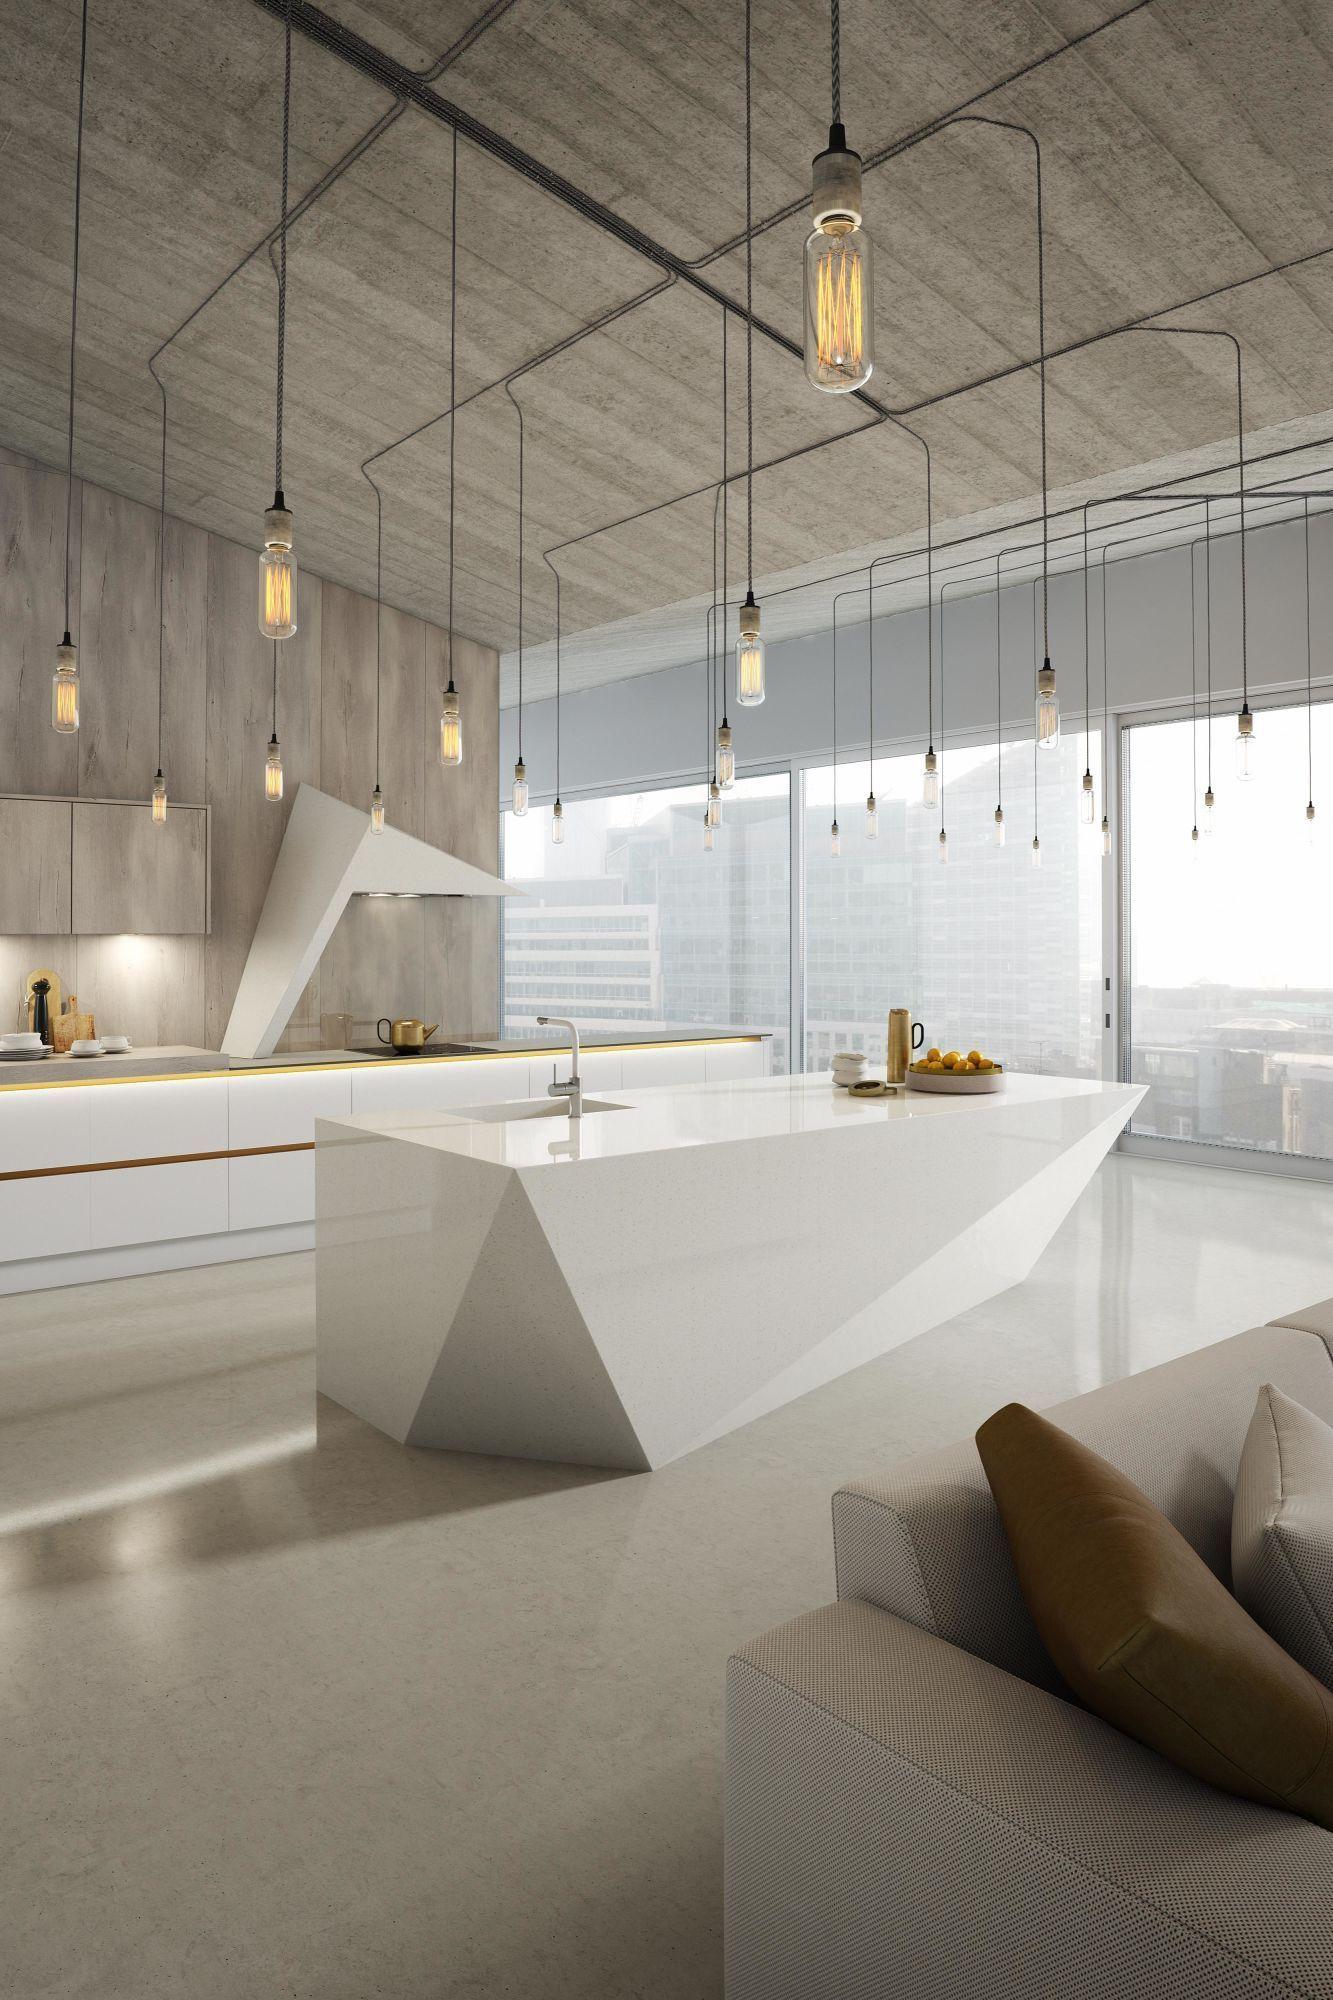 Milano Contour in Chalk White & Arctic Oak kitchen in 2020